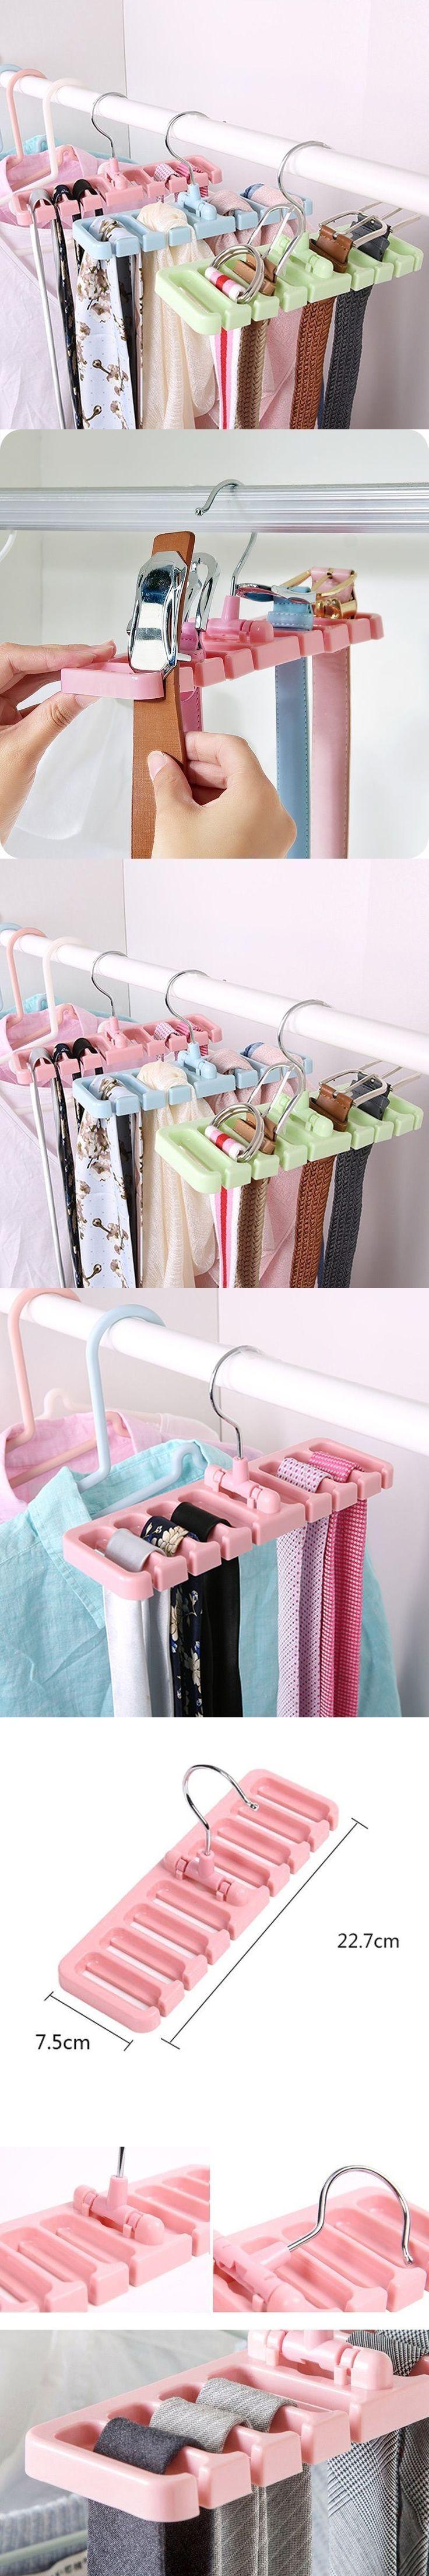 Multifuction Storage Rack Tie Belt Organizer Rotating Ties Hanger Holder Closet Organization Wardrobe Rack Space Saver #tiesorganization #tiesstorage